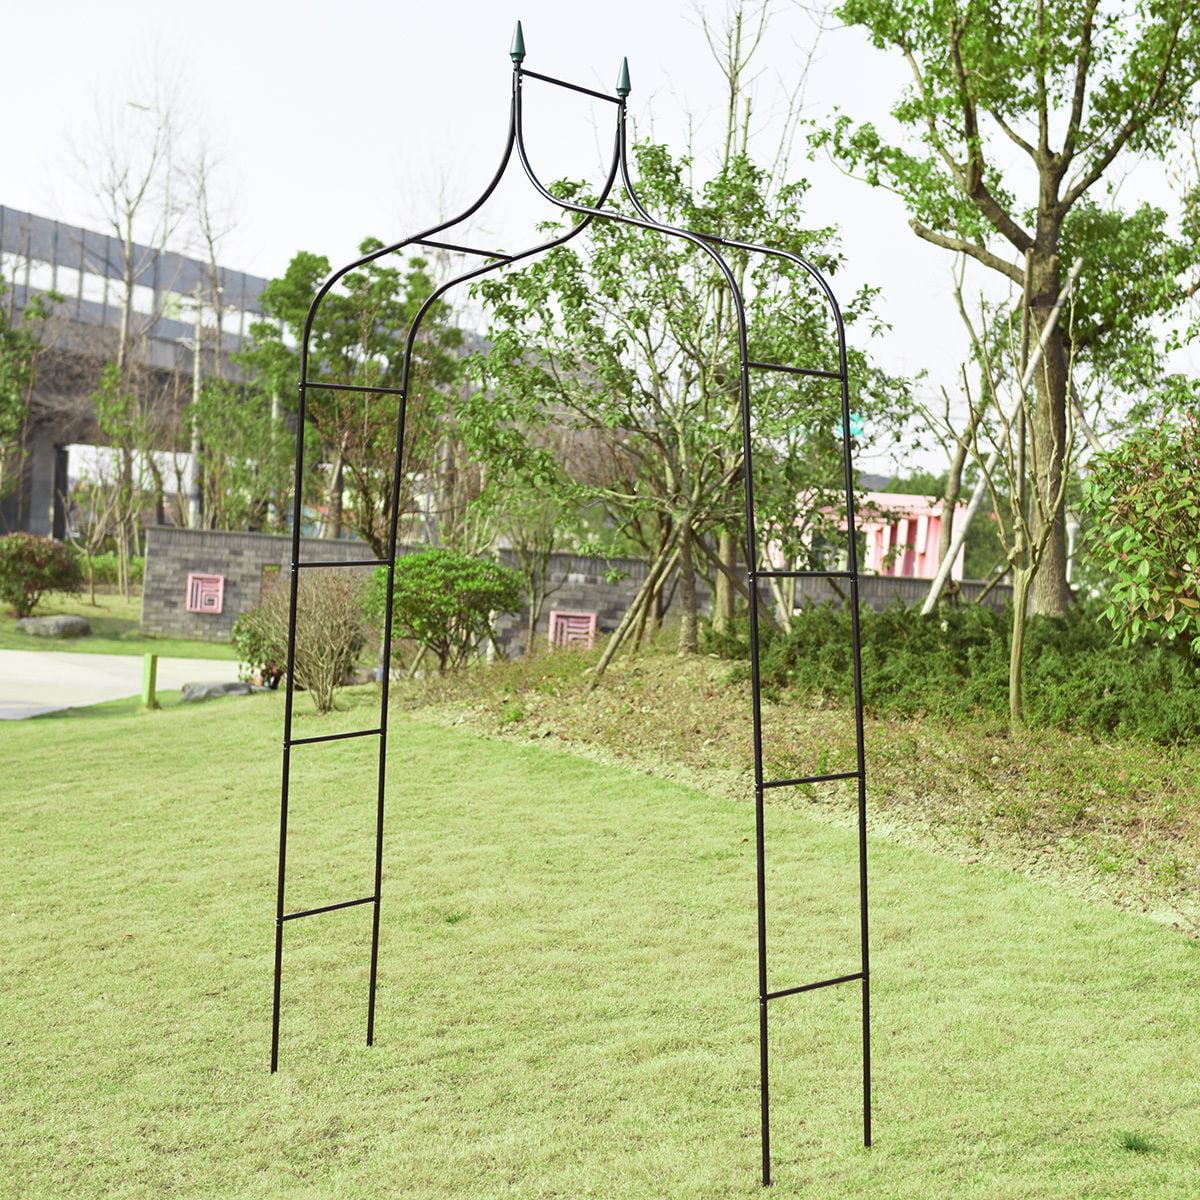 Costway 8'4'' High x 4'7'' Wide Steel Garden Arch Rose Arbor Climbing Plant Outdoor Garden by Costway